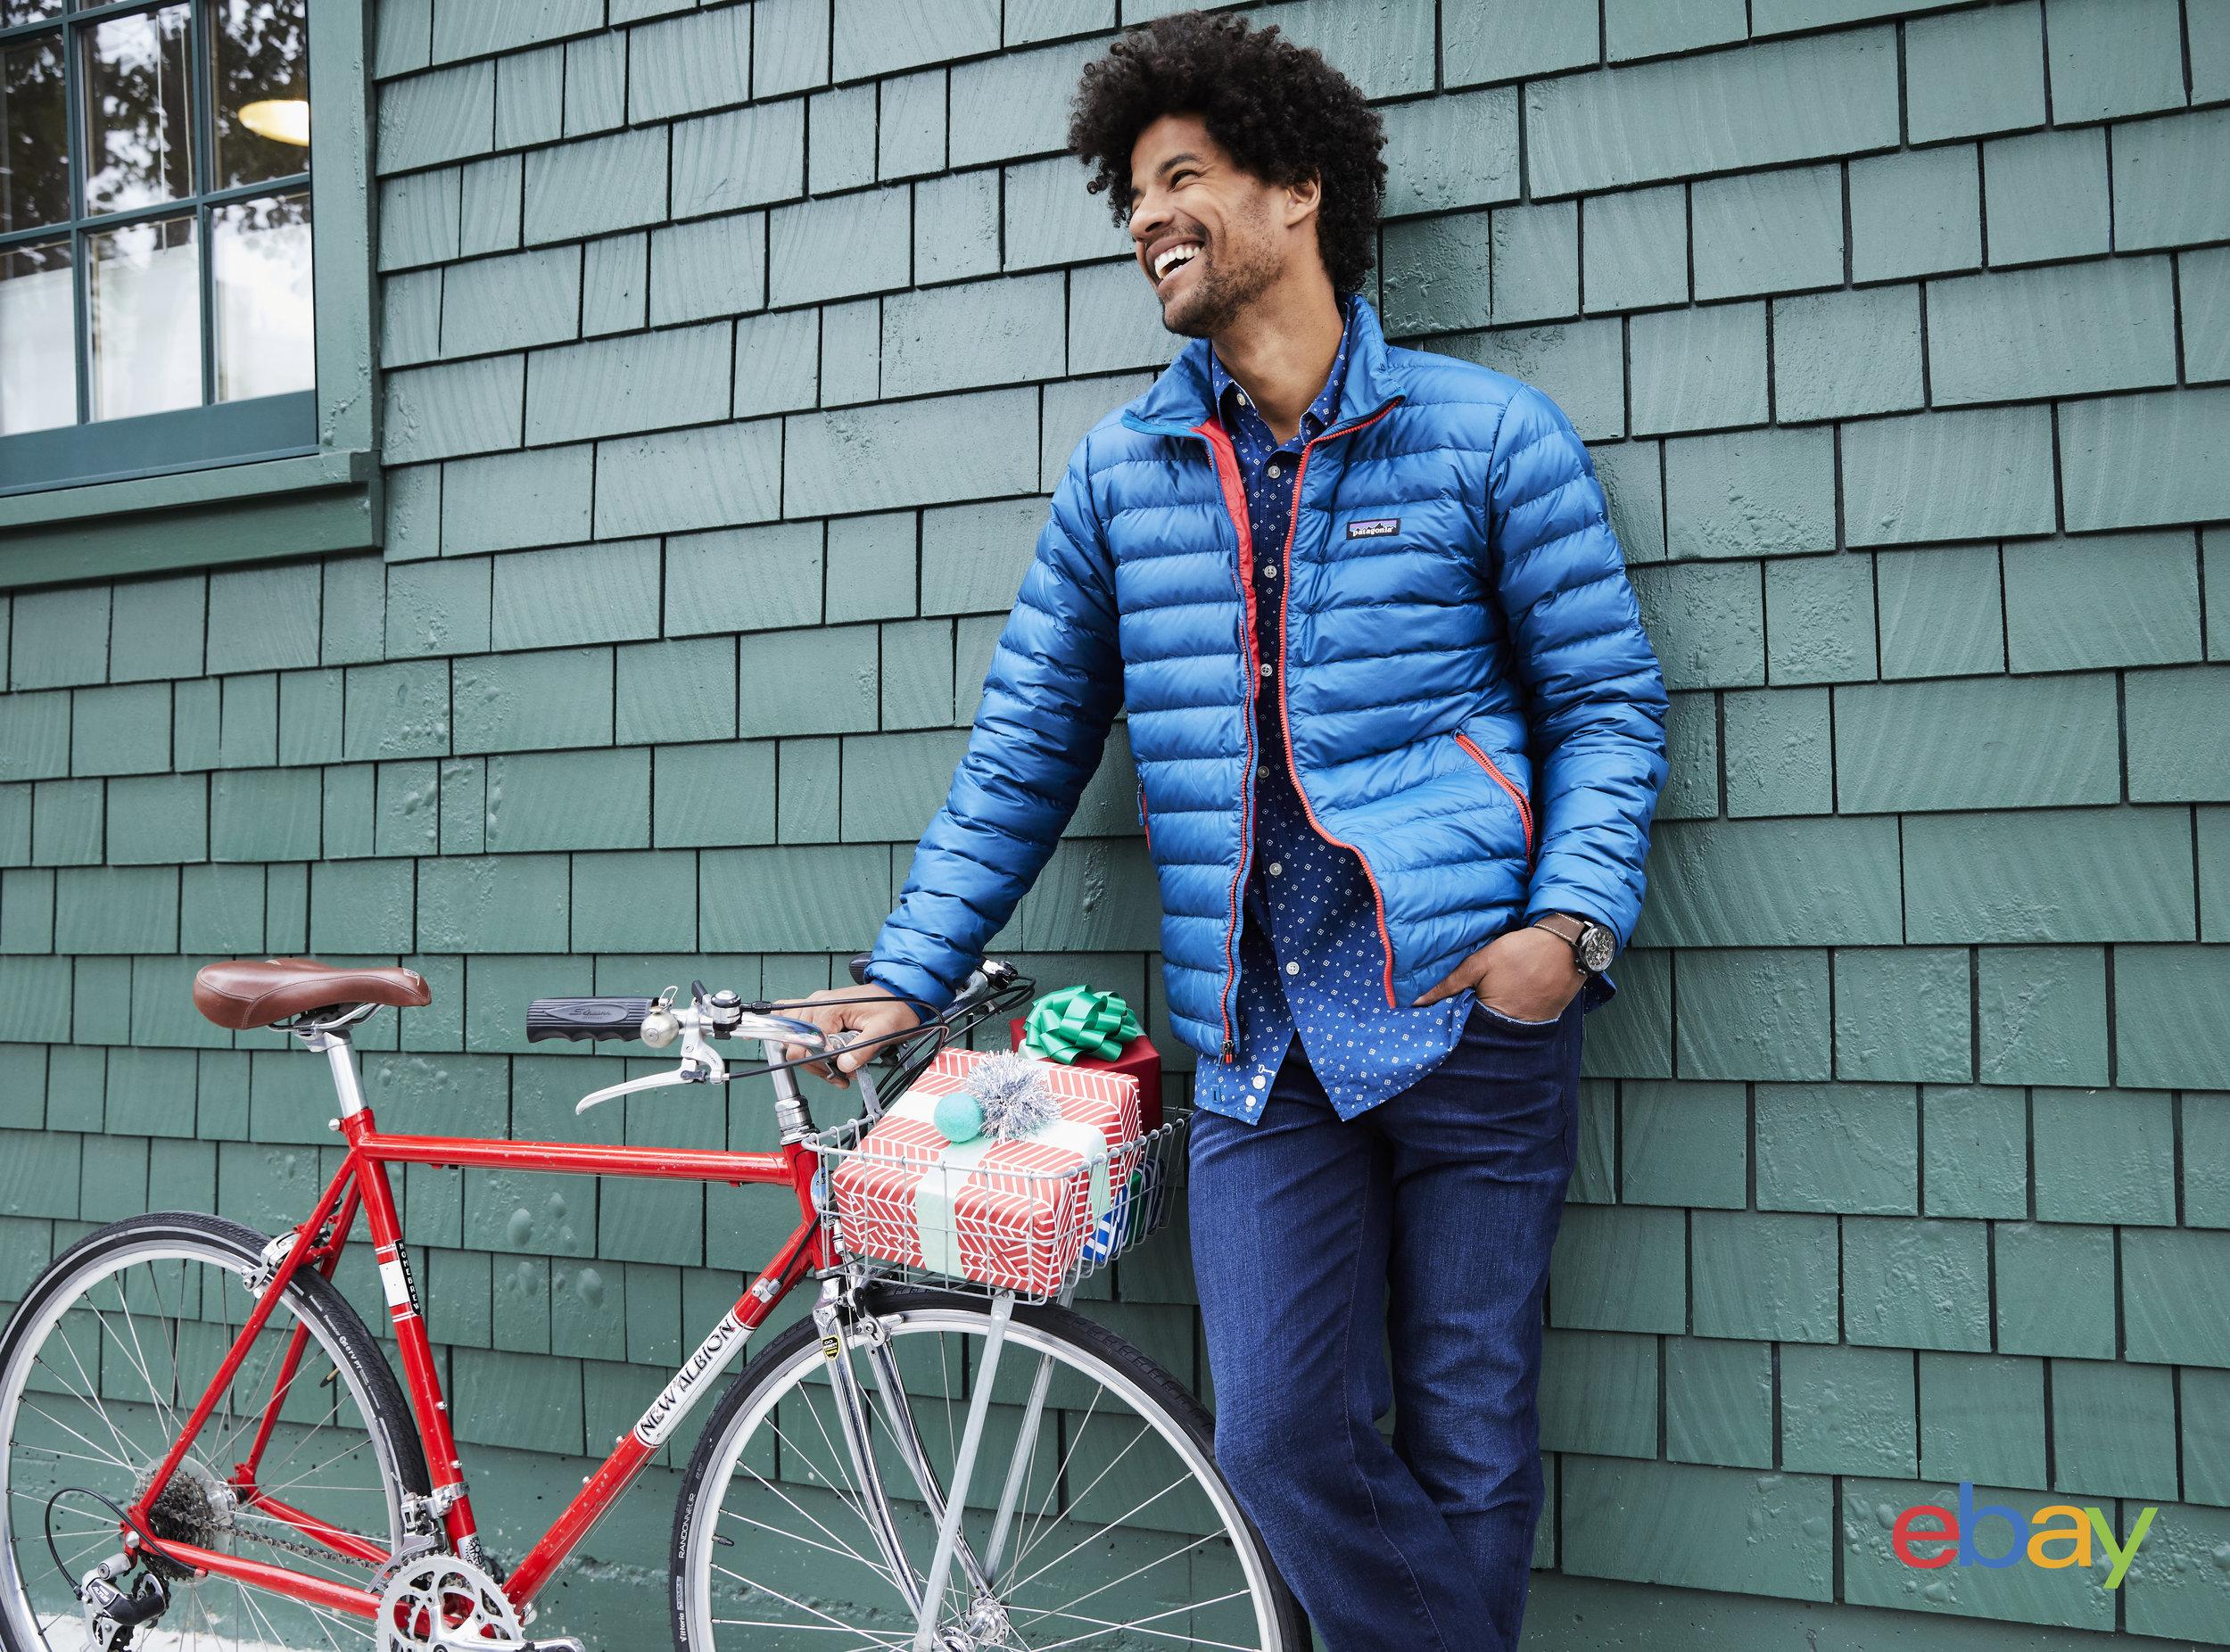 Holiday18_Fashion_Mens_Outerwear_Coats_Jackets_3532.jpg